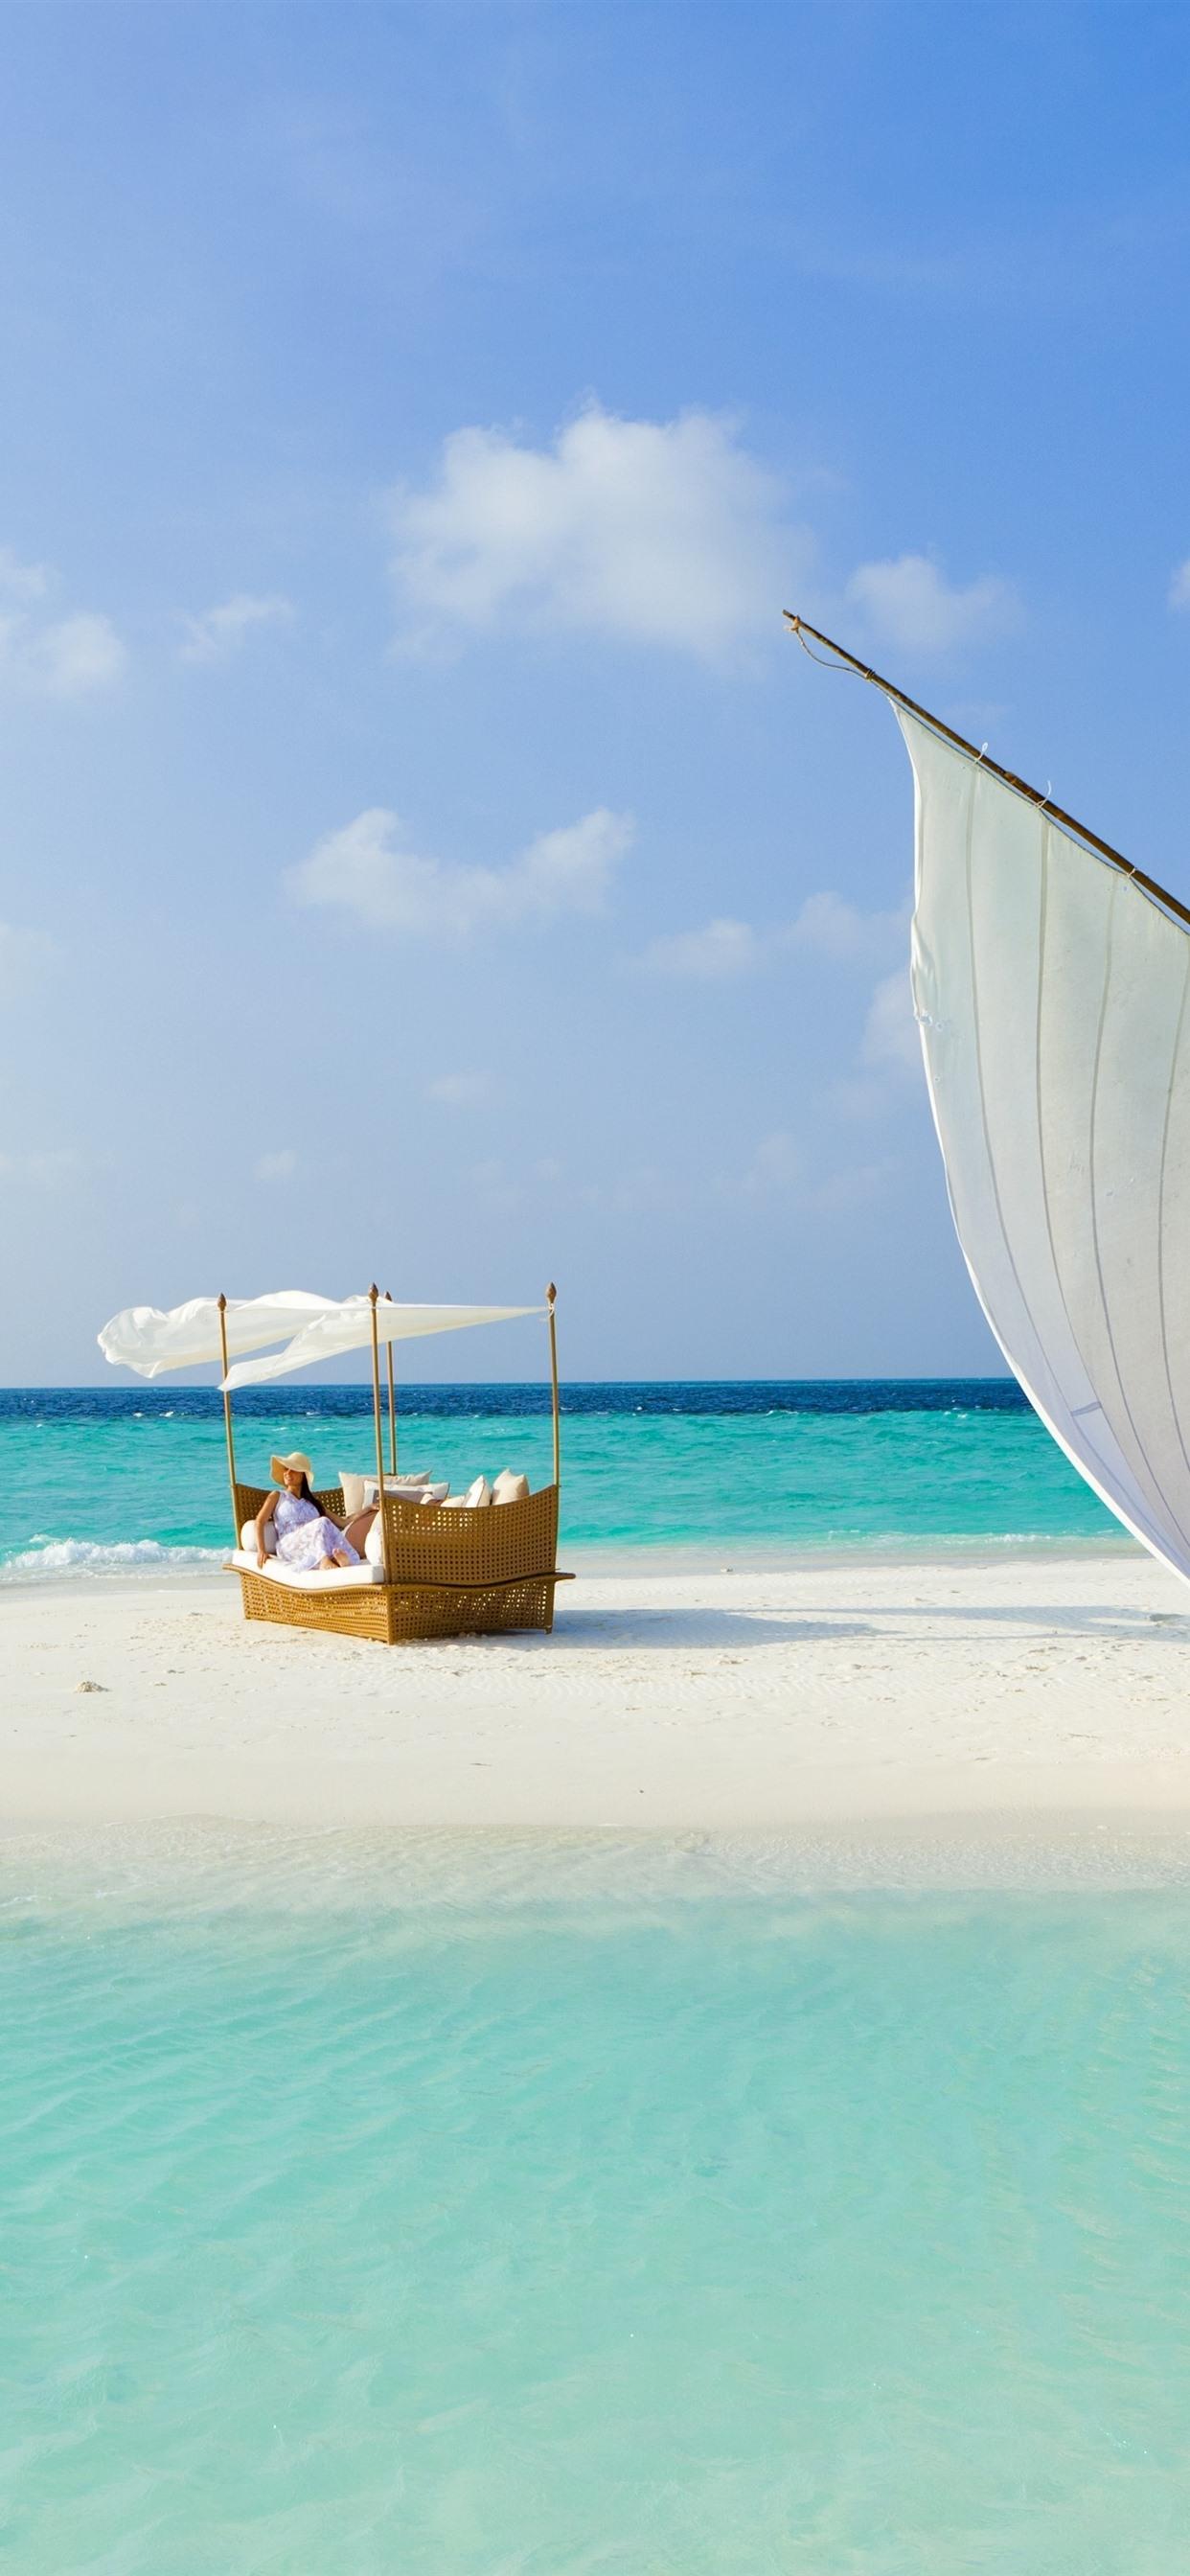 Maldives Sea Beach Sailboat Girl Bed 1242x2688 Iphone